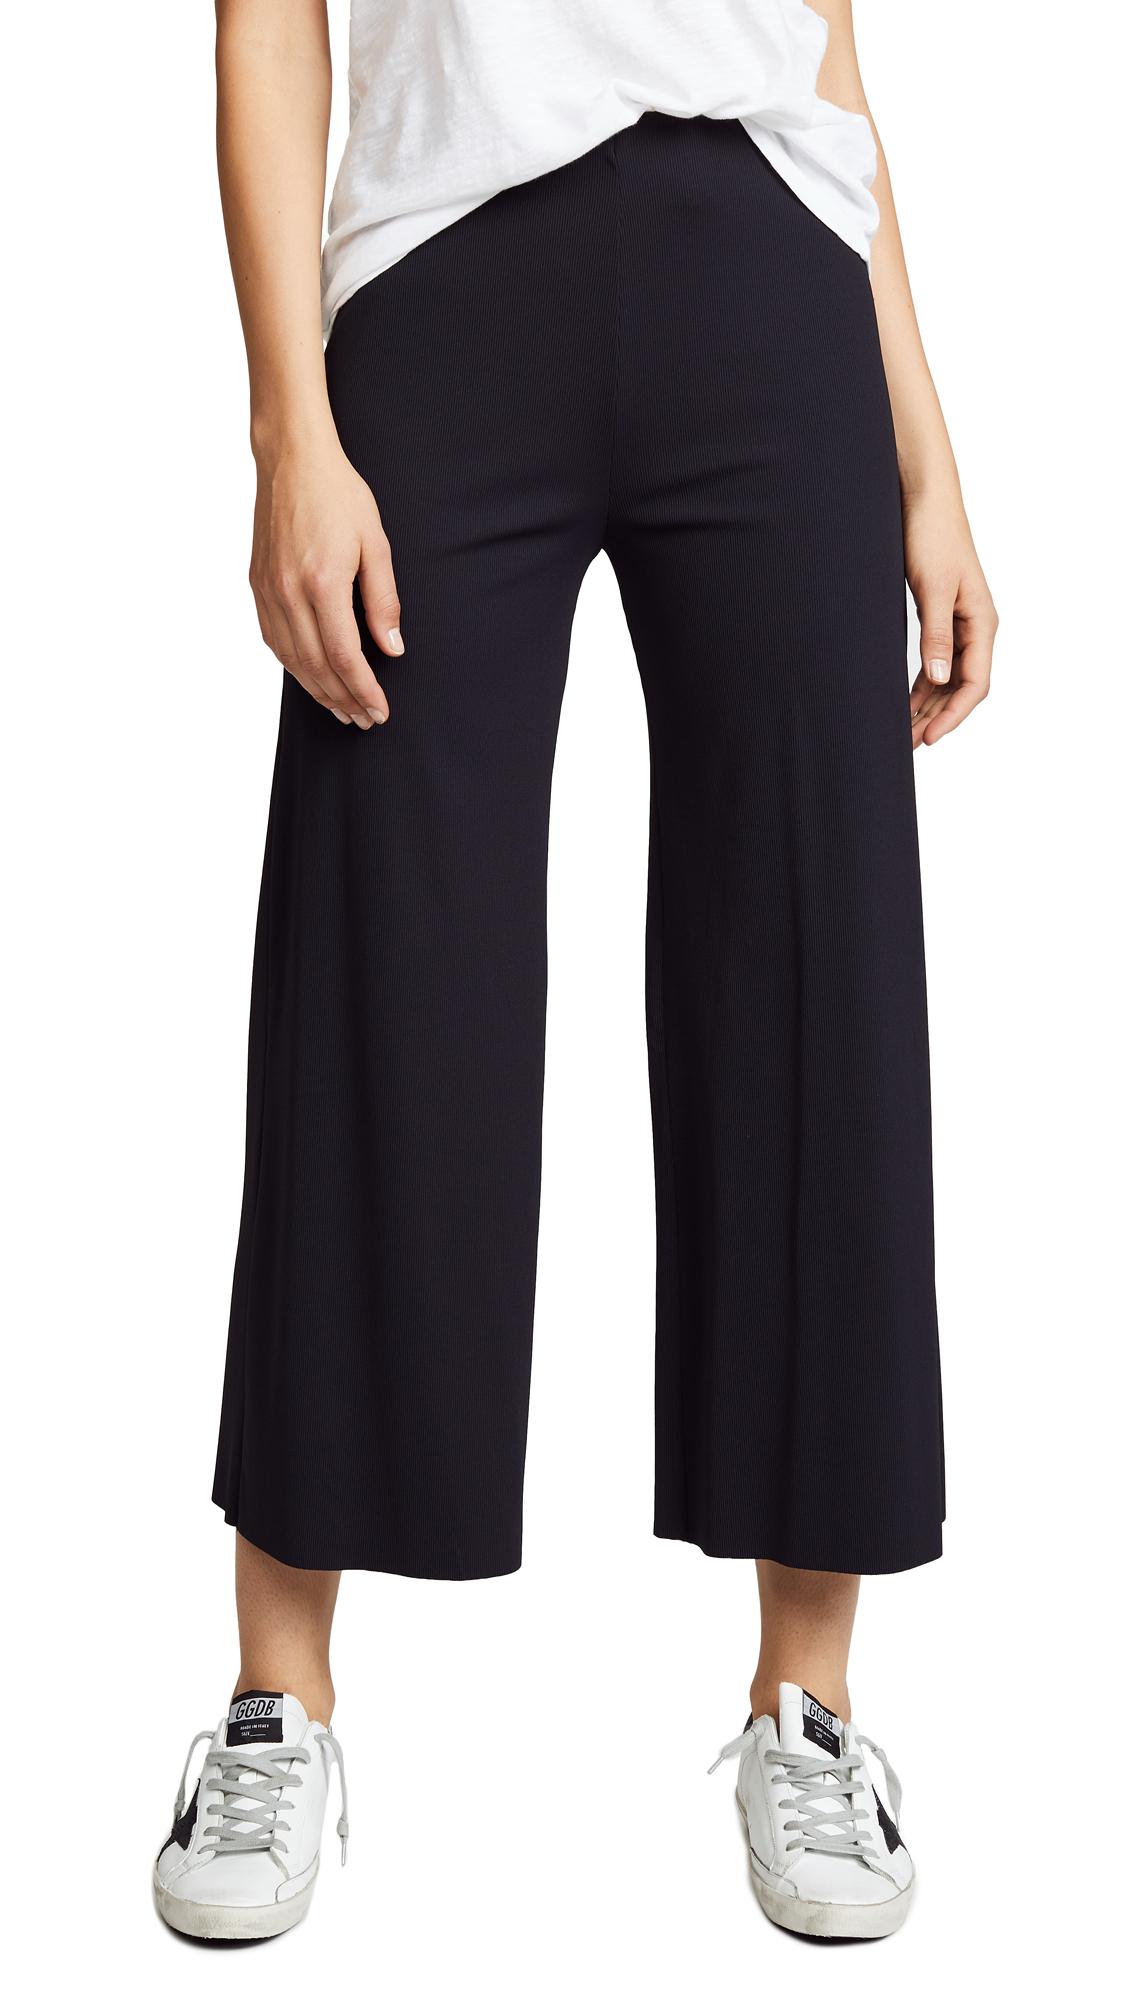 Lanston Ribbed Cropped Pants In Black